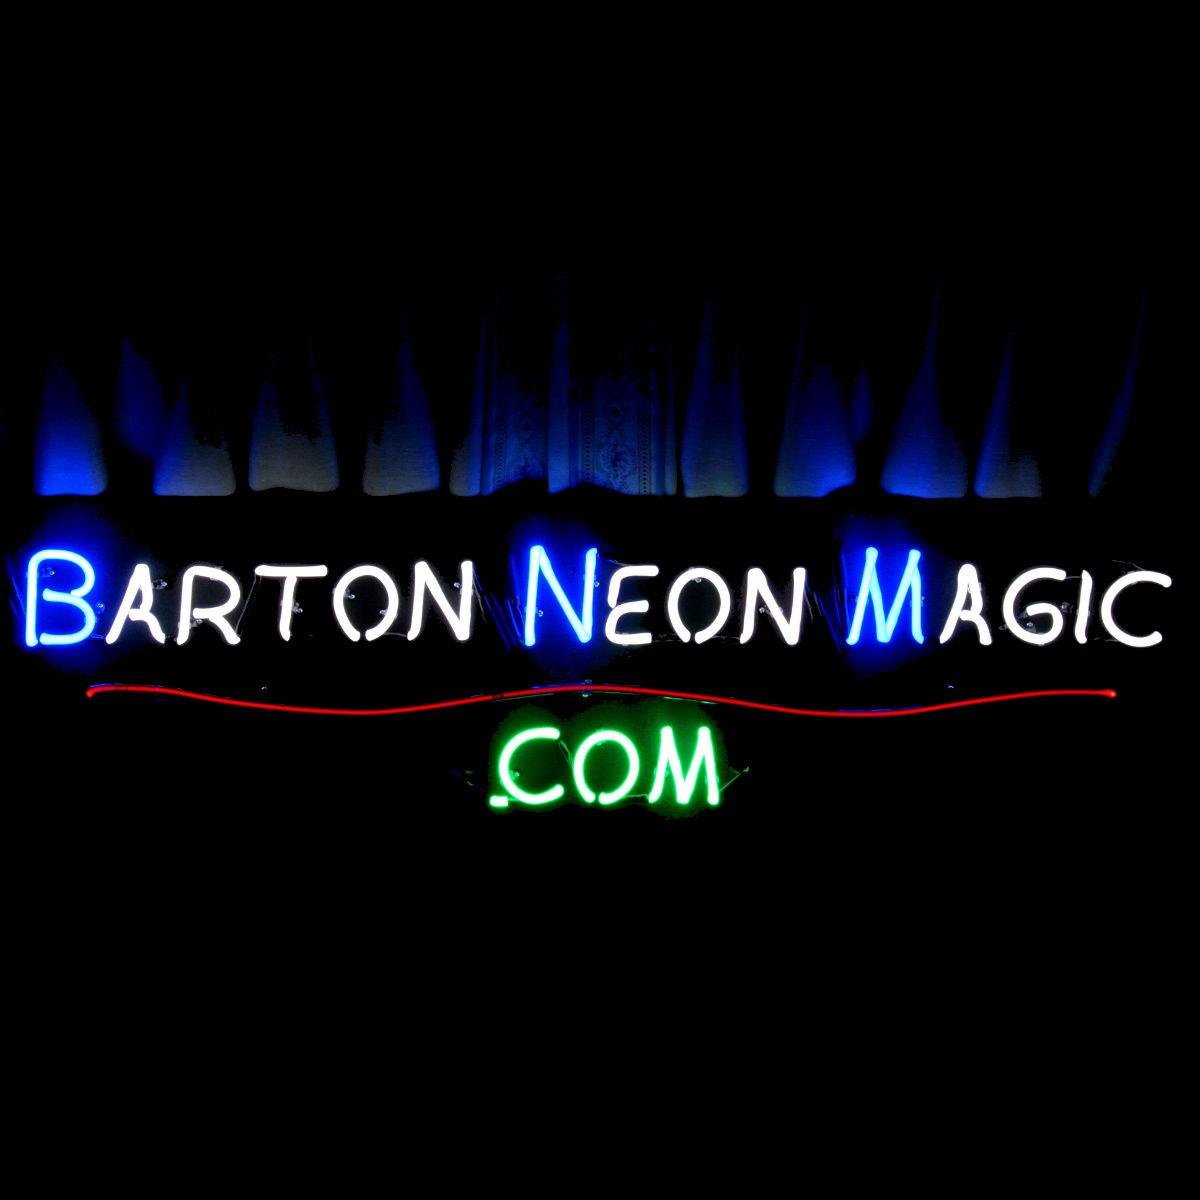 AVANTI NEON SIGNS by John Barton - Famous USA Neon Glass Artist - BartonNeonMagic.com